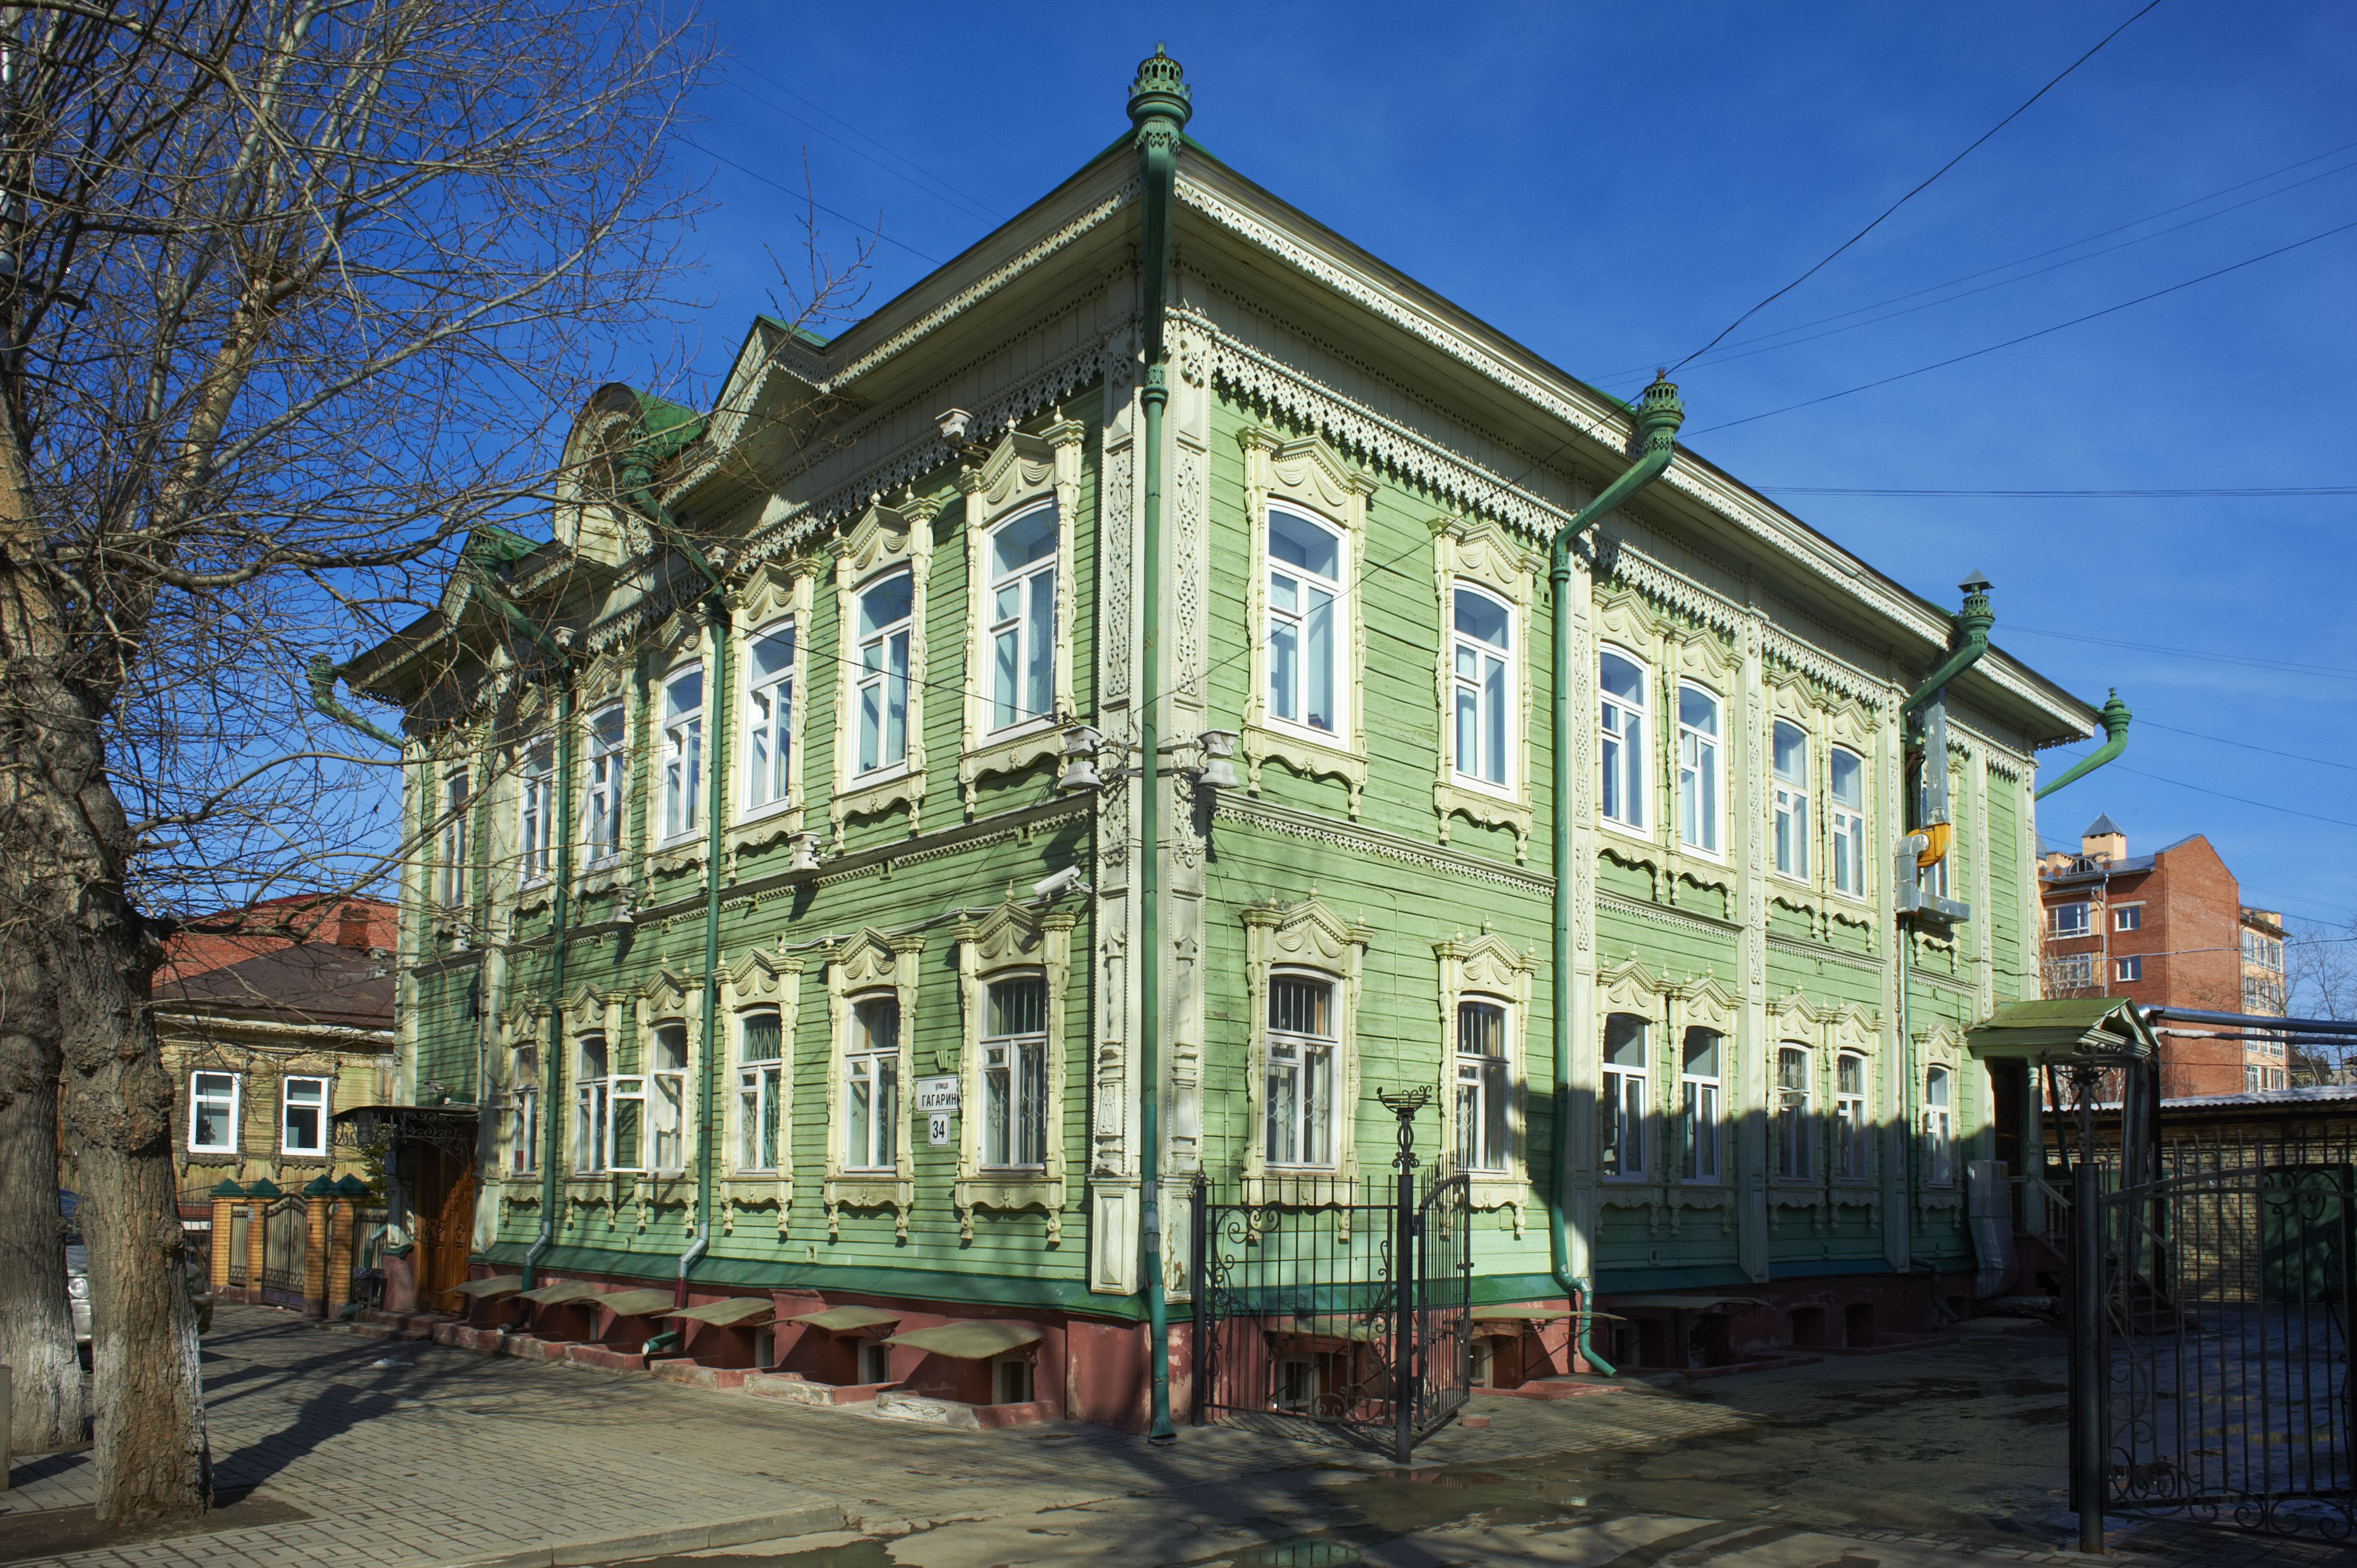 Rusia, Tomsk, arquitectura de madera